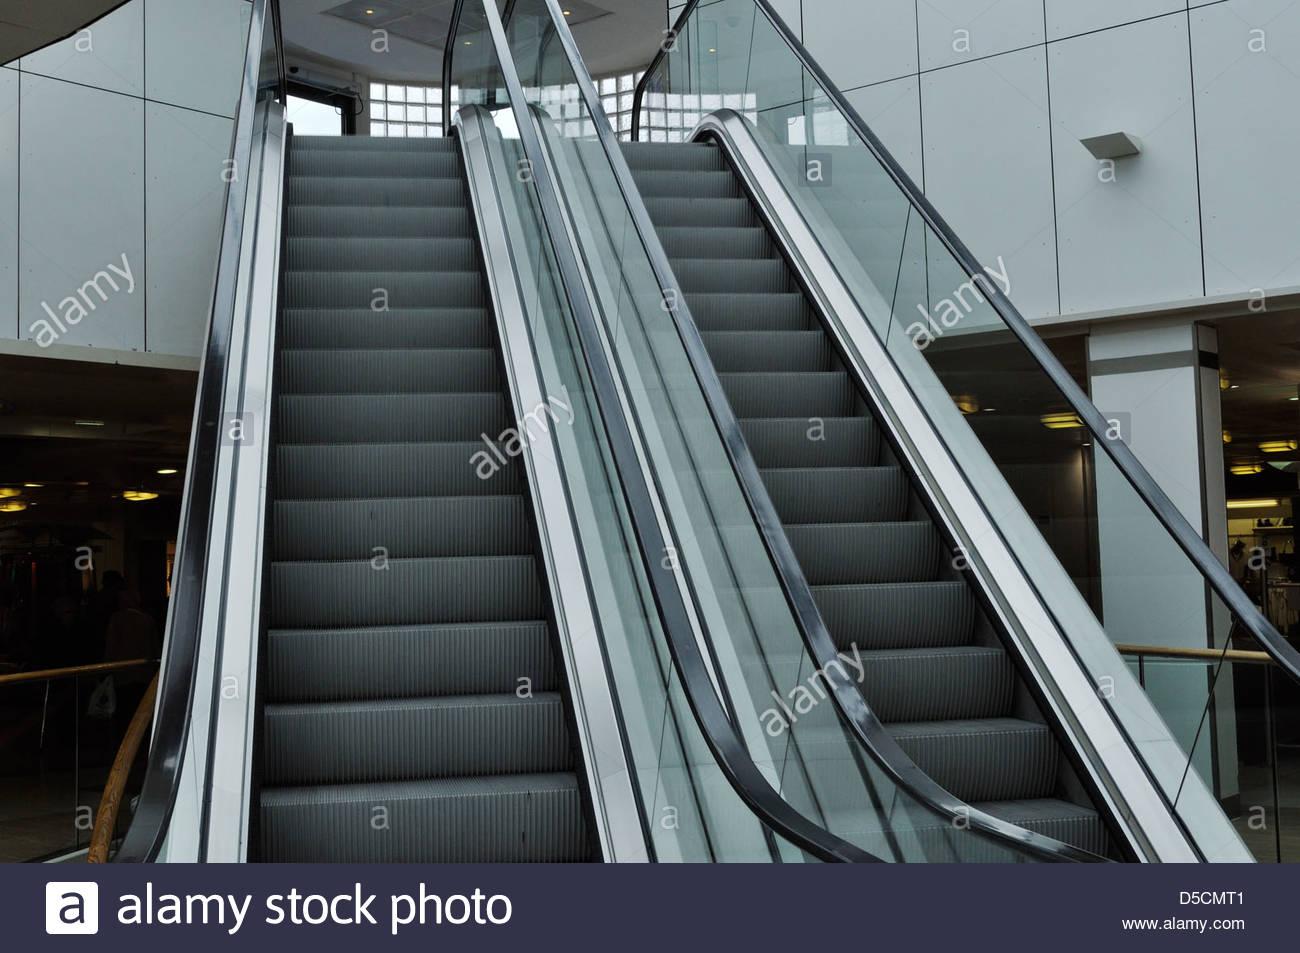 Escalators in shopping centre - Stock Image